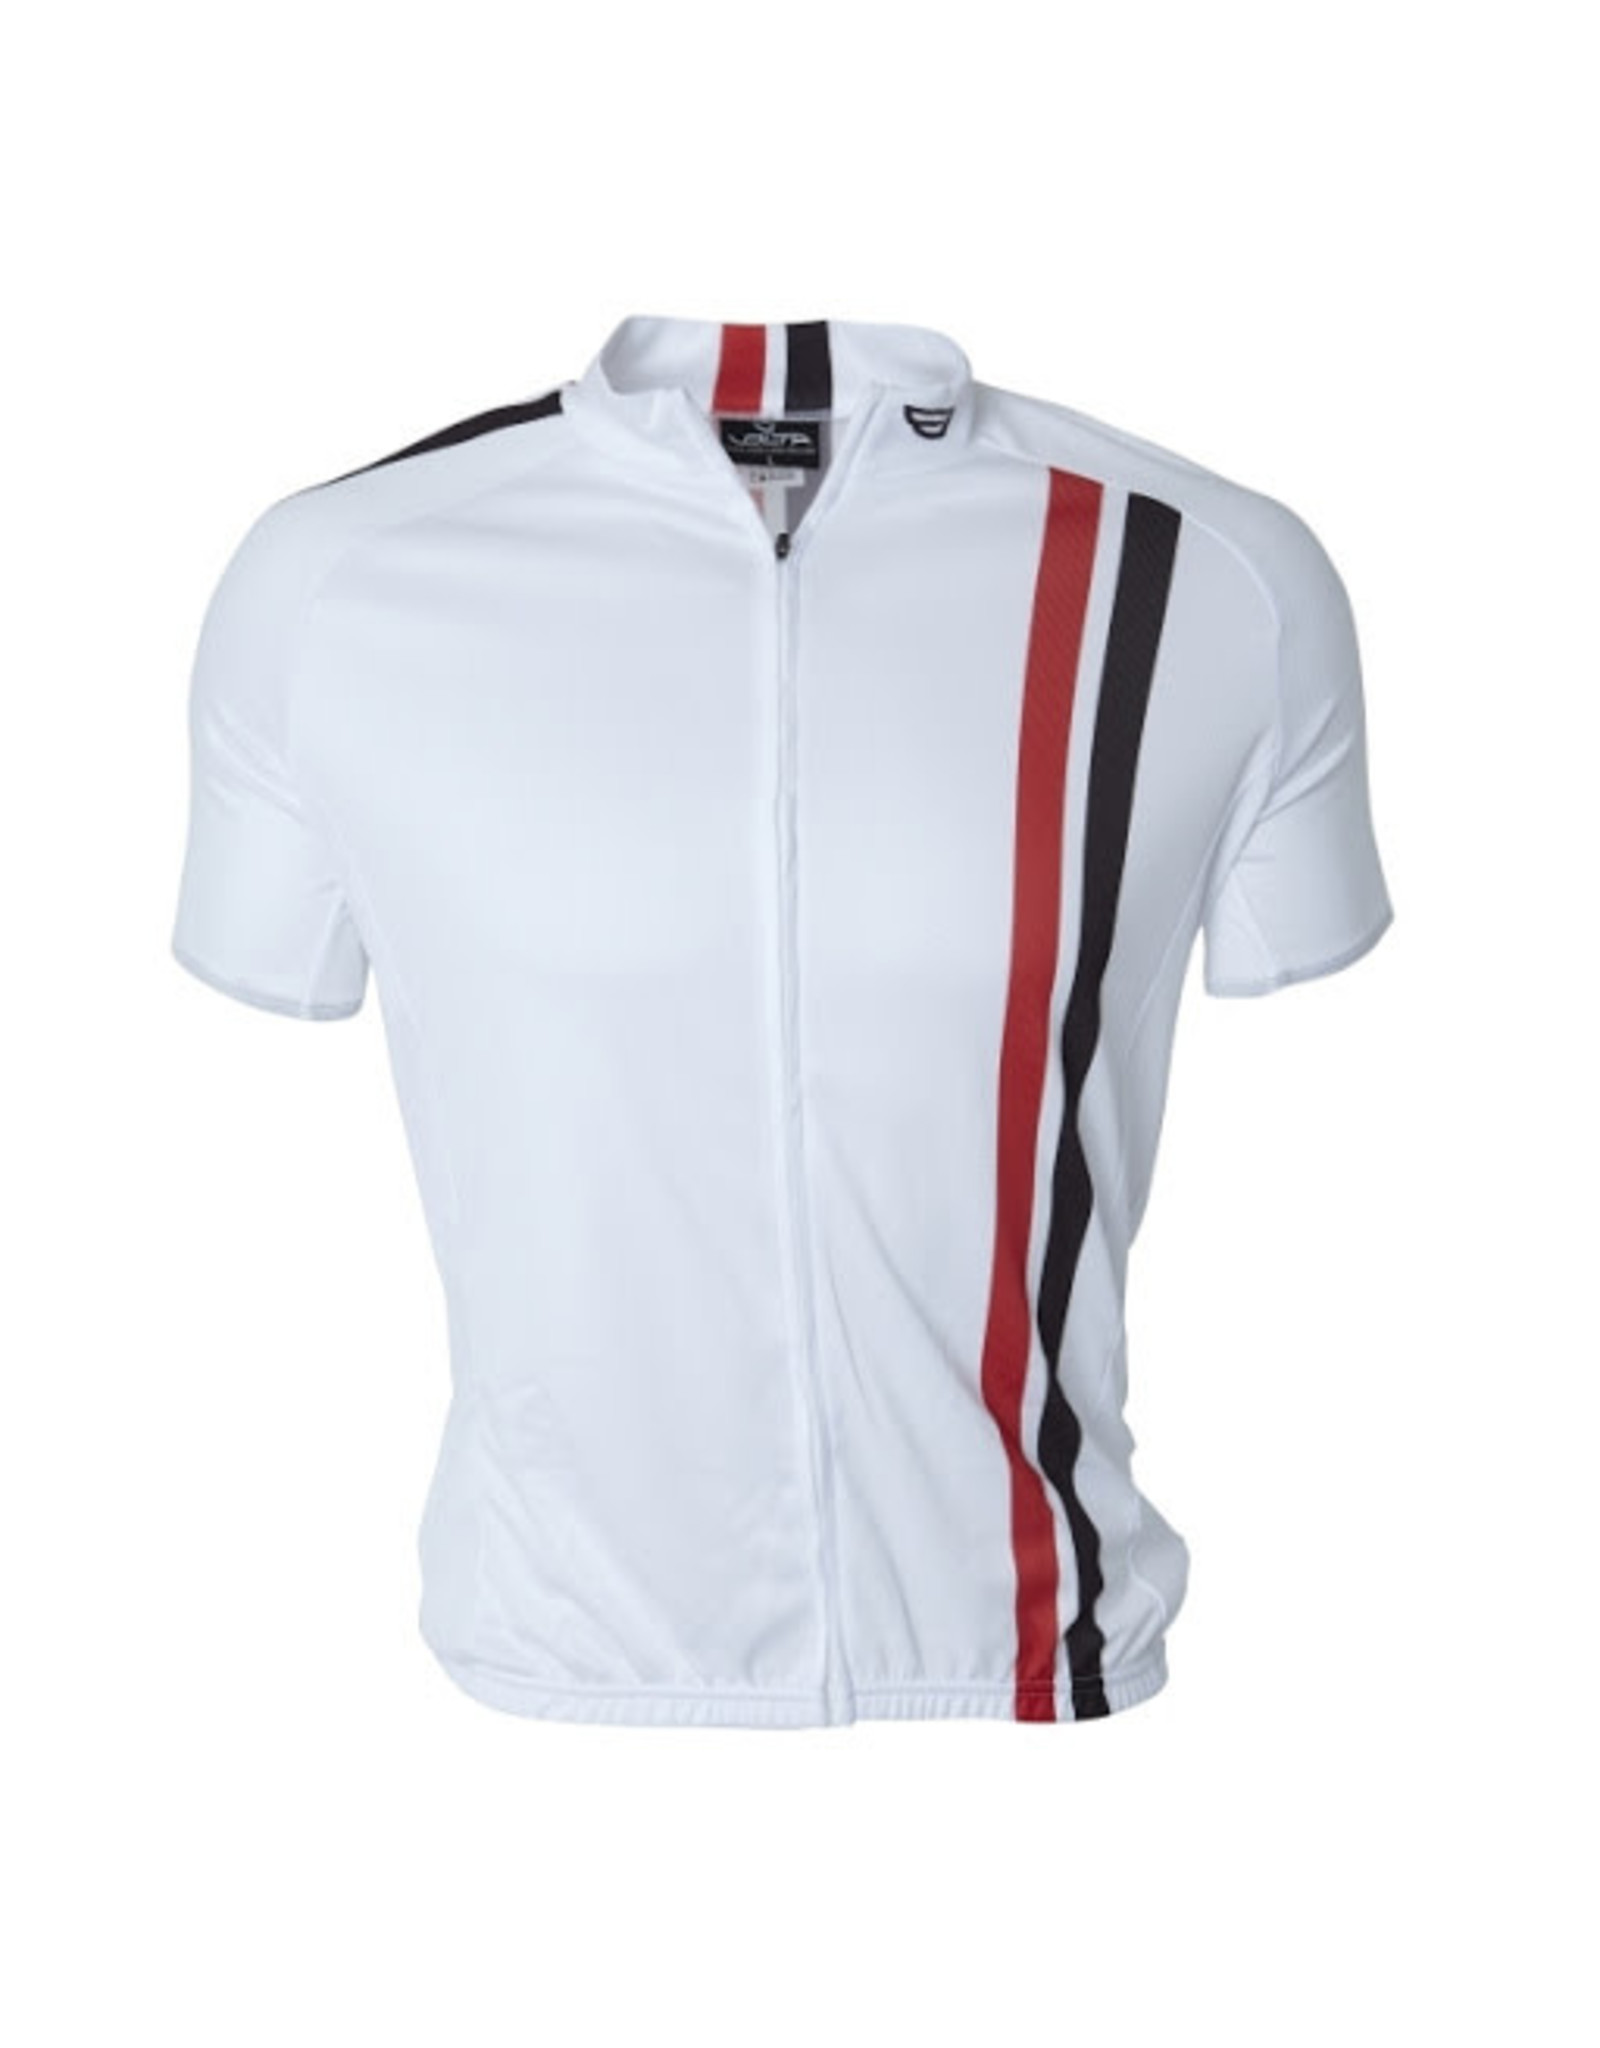 Volta SS Sport Cycling Jersey White SML